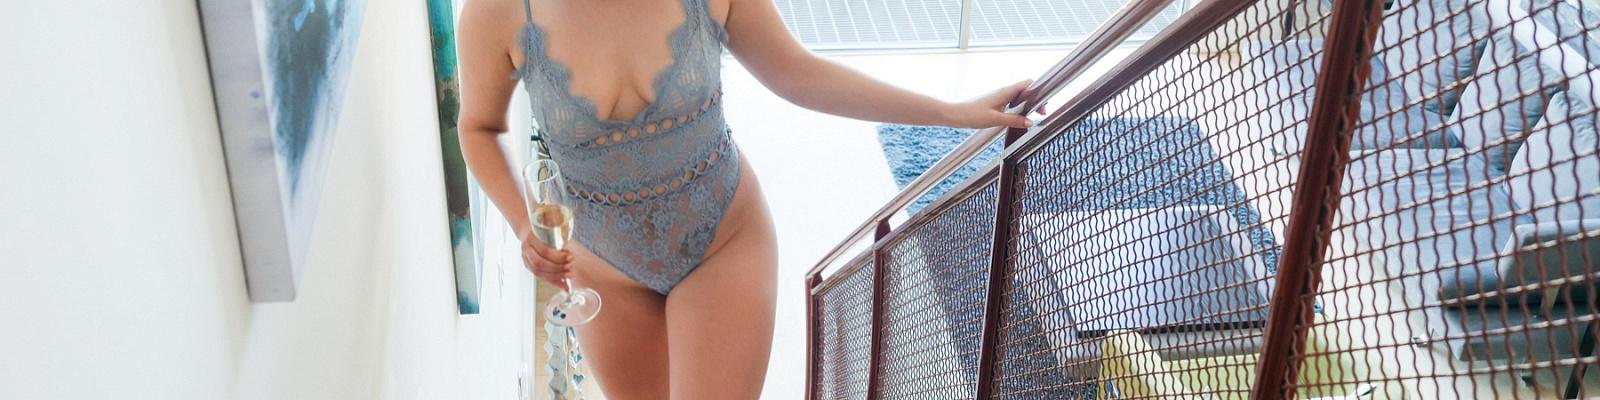 Xxx Candice Nicole New York Escorts Massage Gfe Adult